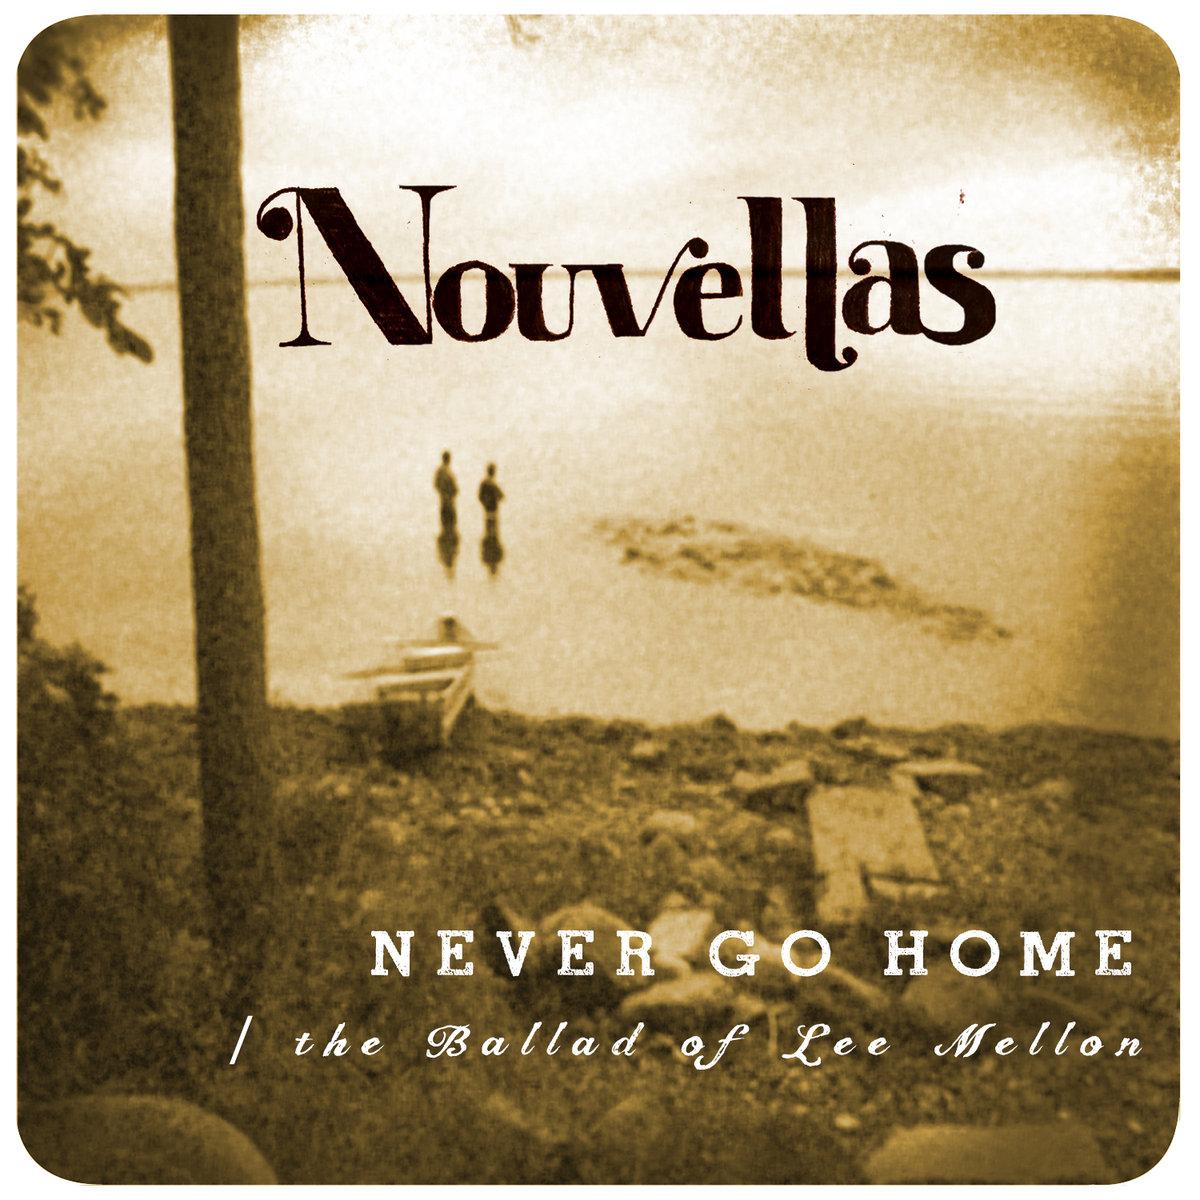 Nouvellas - Never Go Home